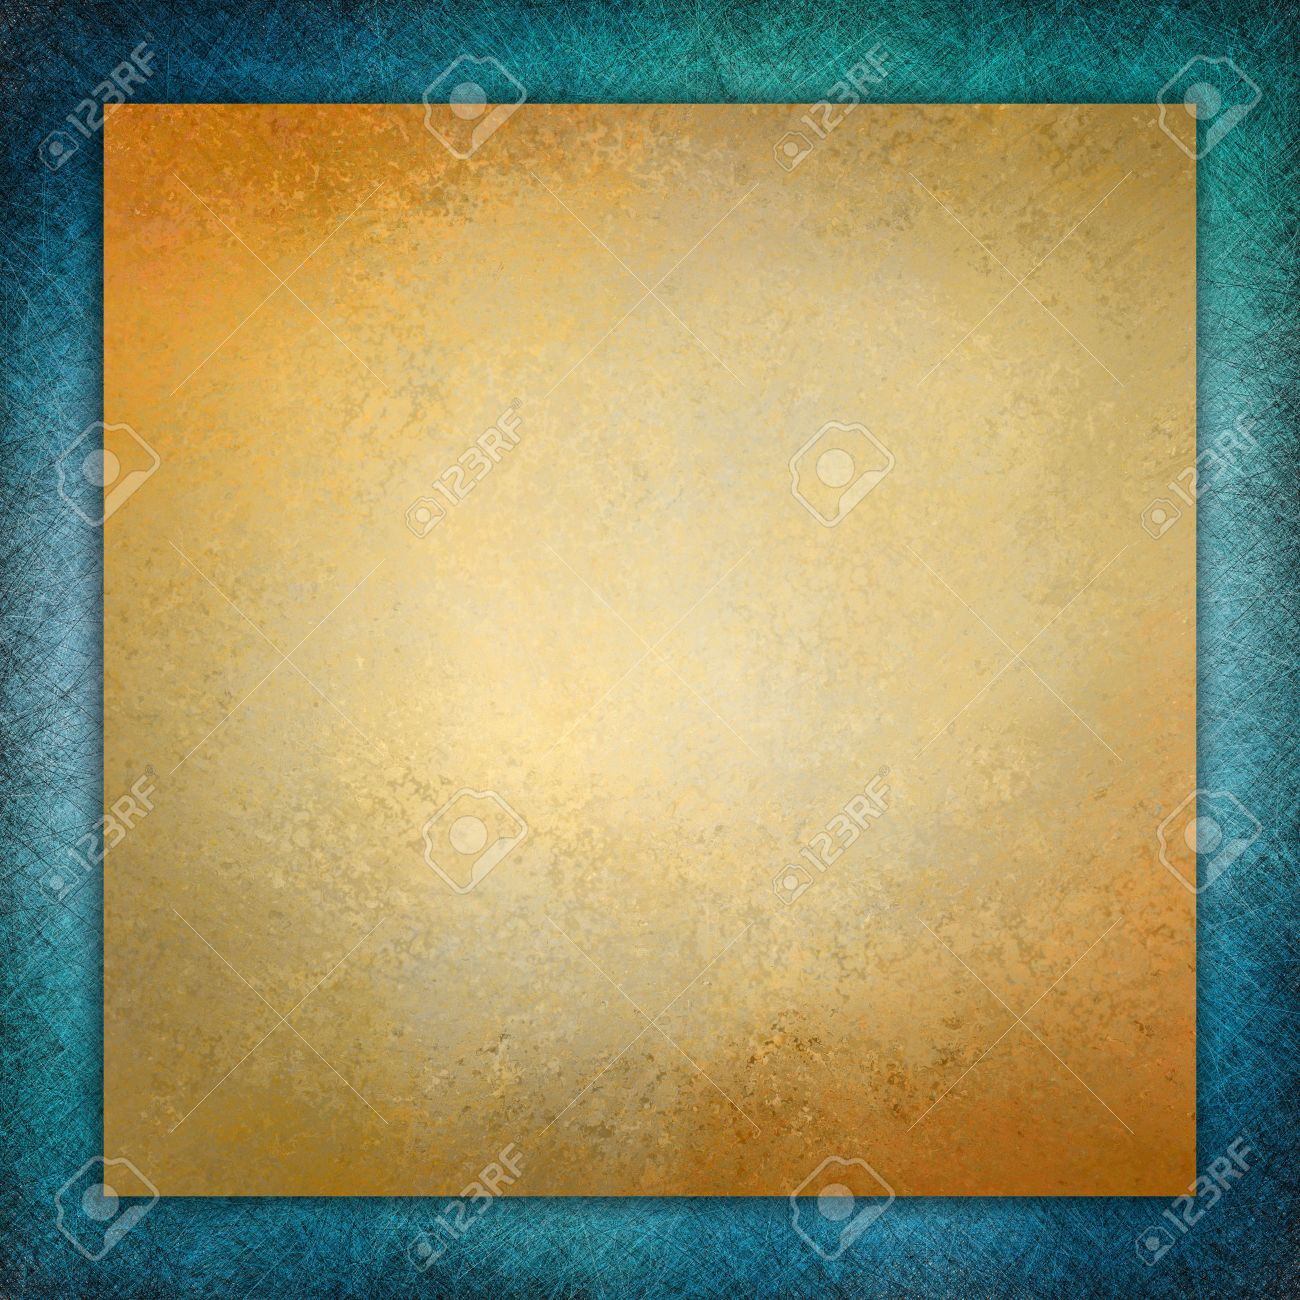 Elegant Gold Background Texture Paper, Faint Rustic Teal Blue ...